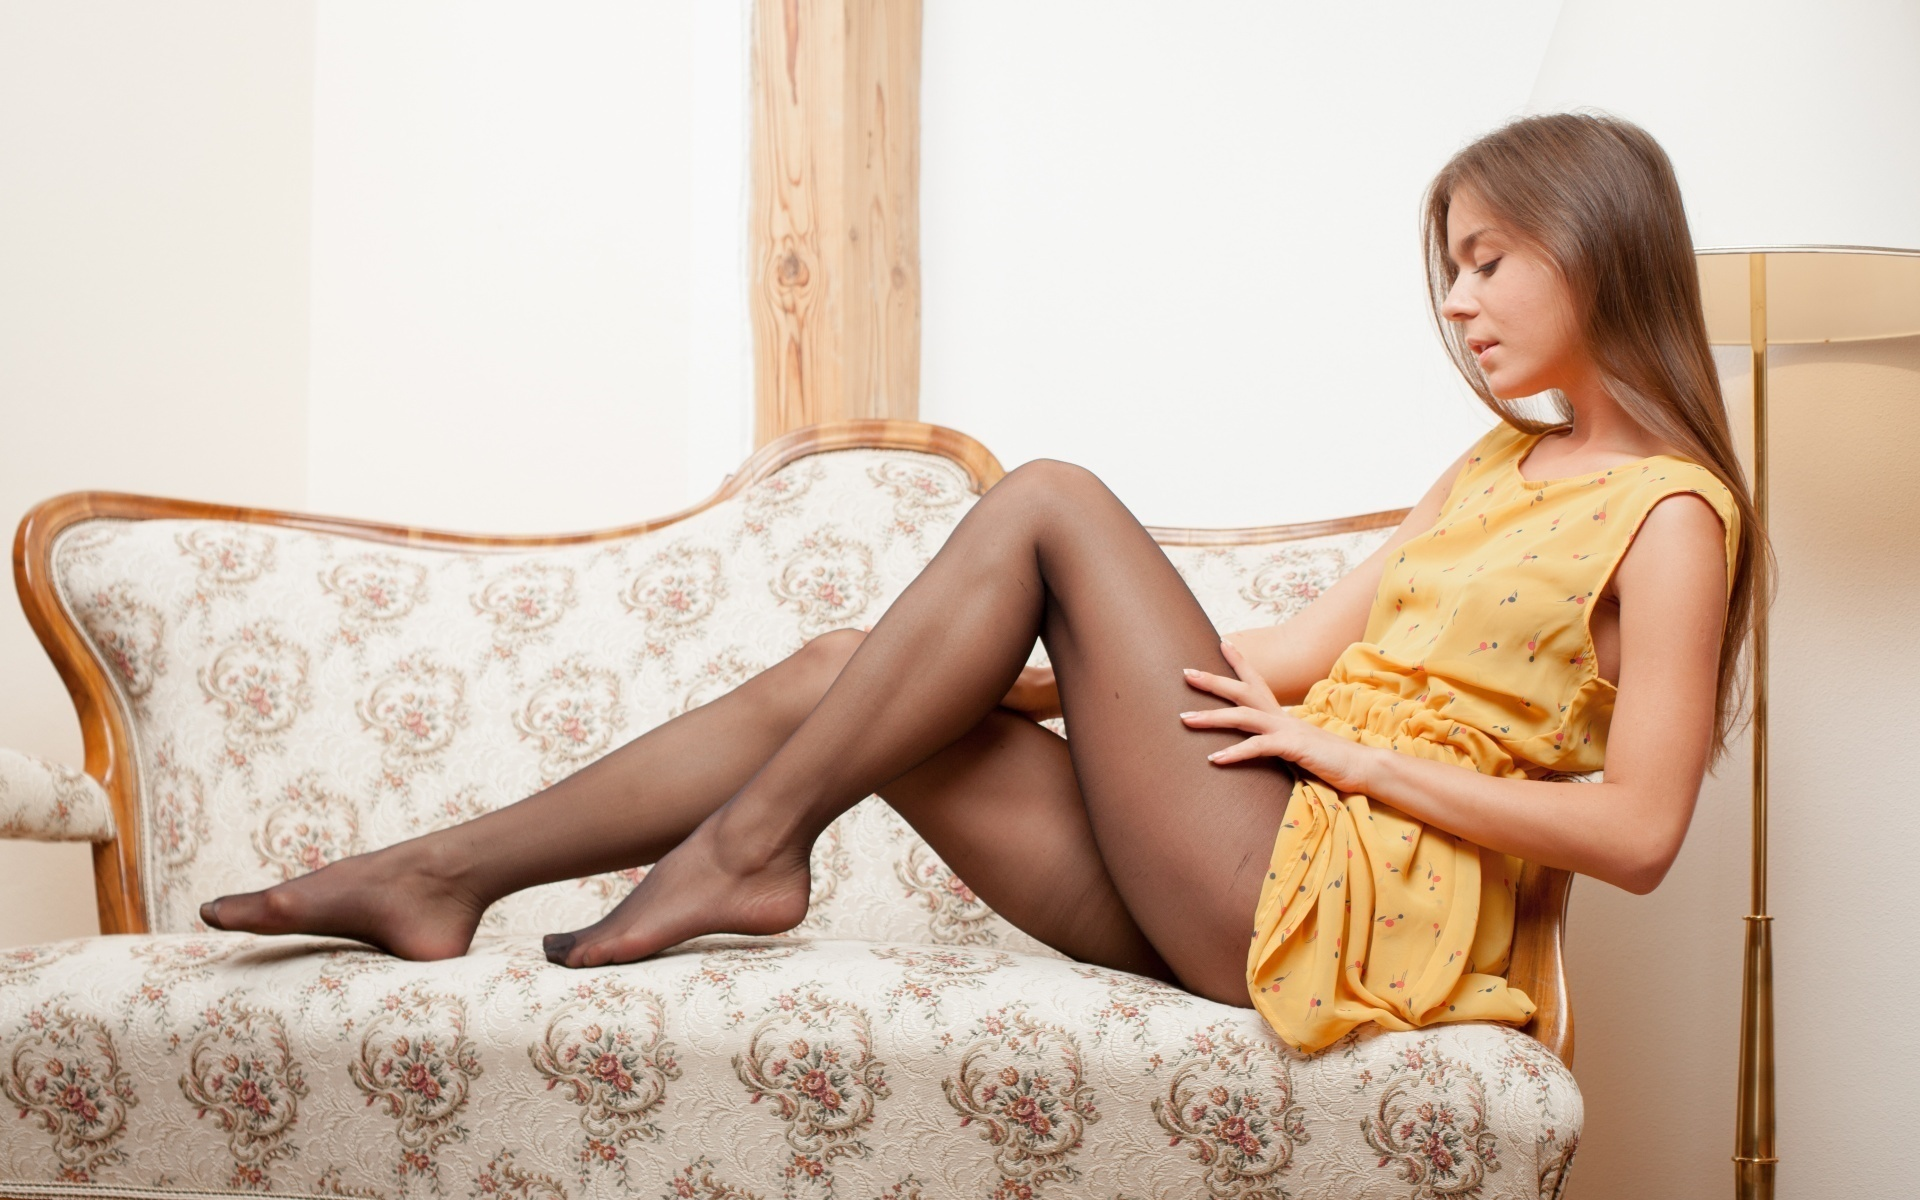 Фото и видео девушки в платьях и колготках фото 722-521